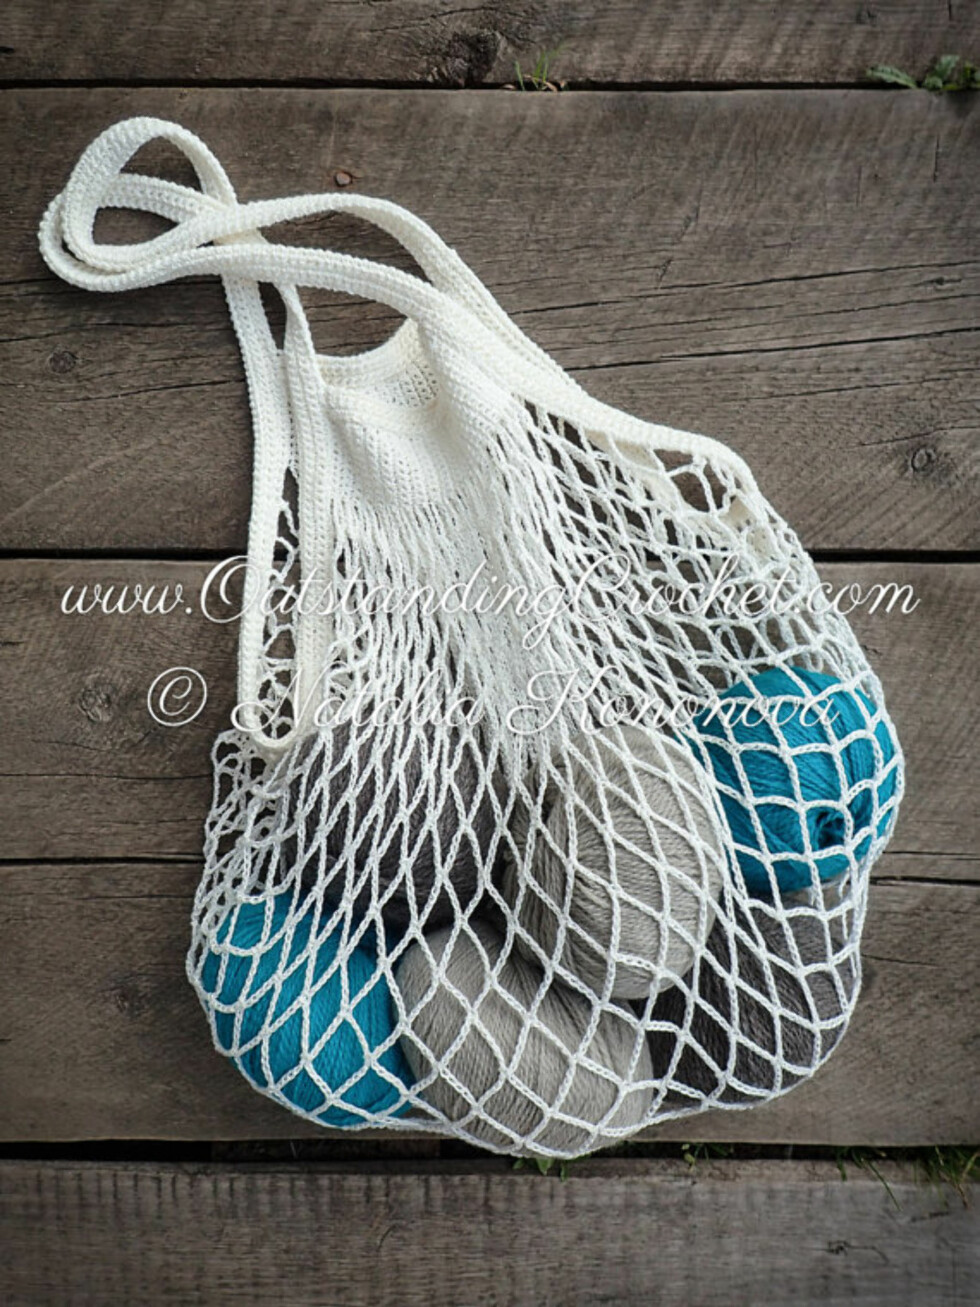 Nett-veske via Etsy | kr 54 | https://www.etsy.com/no-en/listing/457054522/crochet-market-bag-pattern-grocery?ref=hp_rv